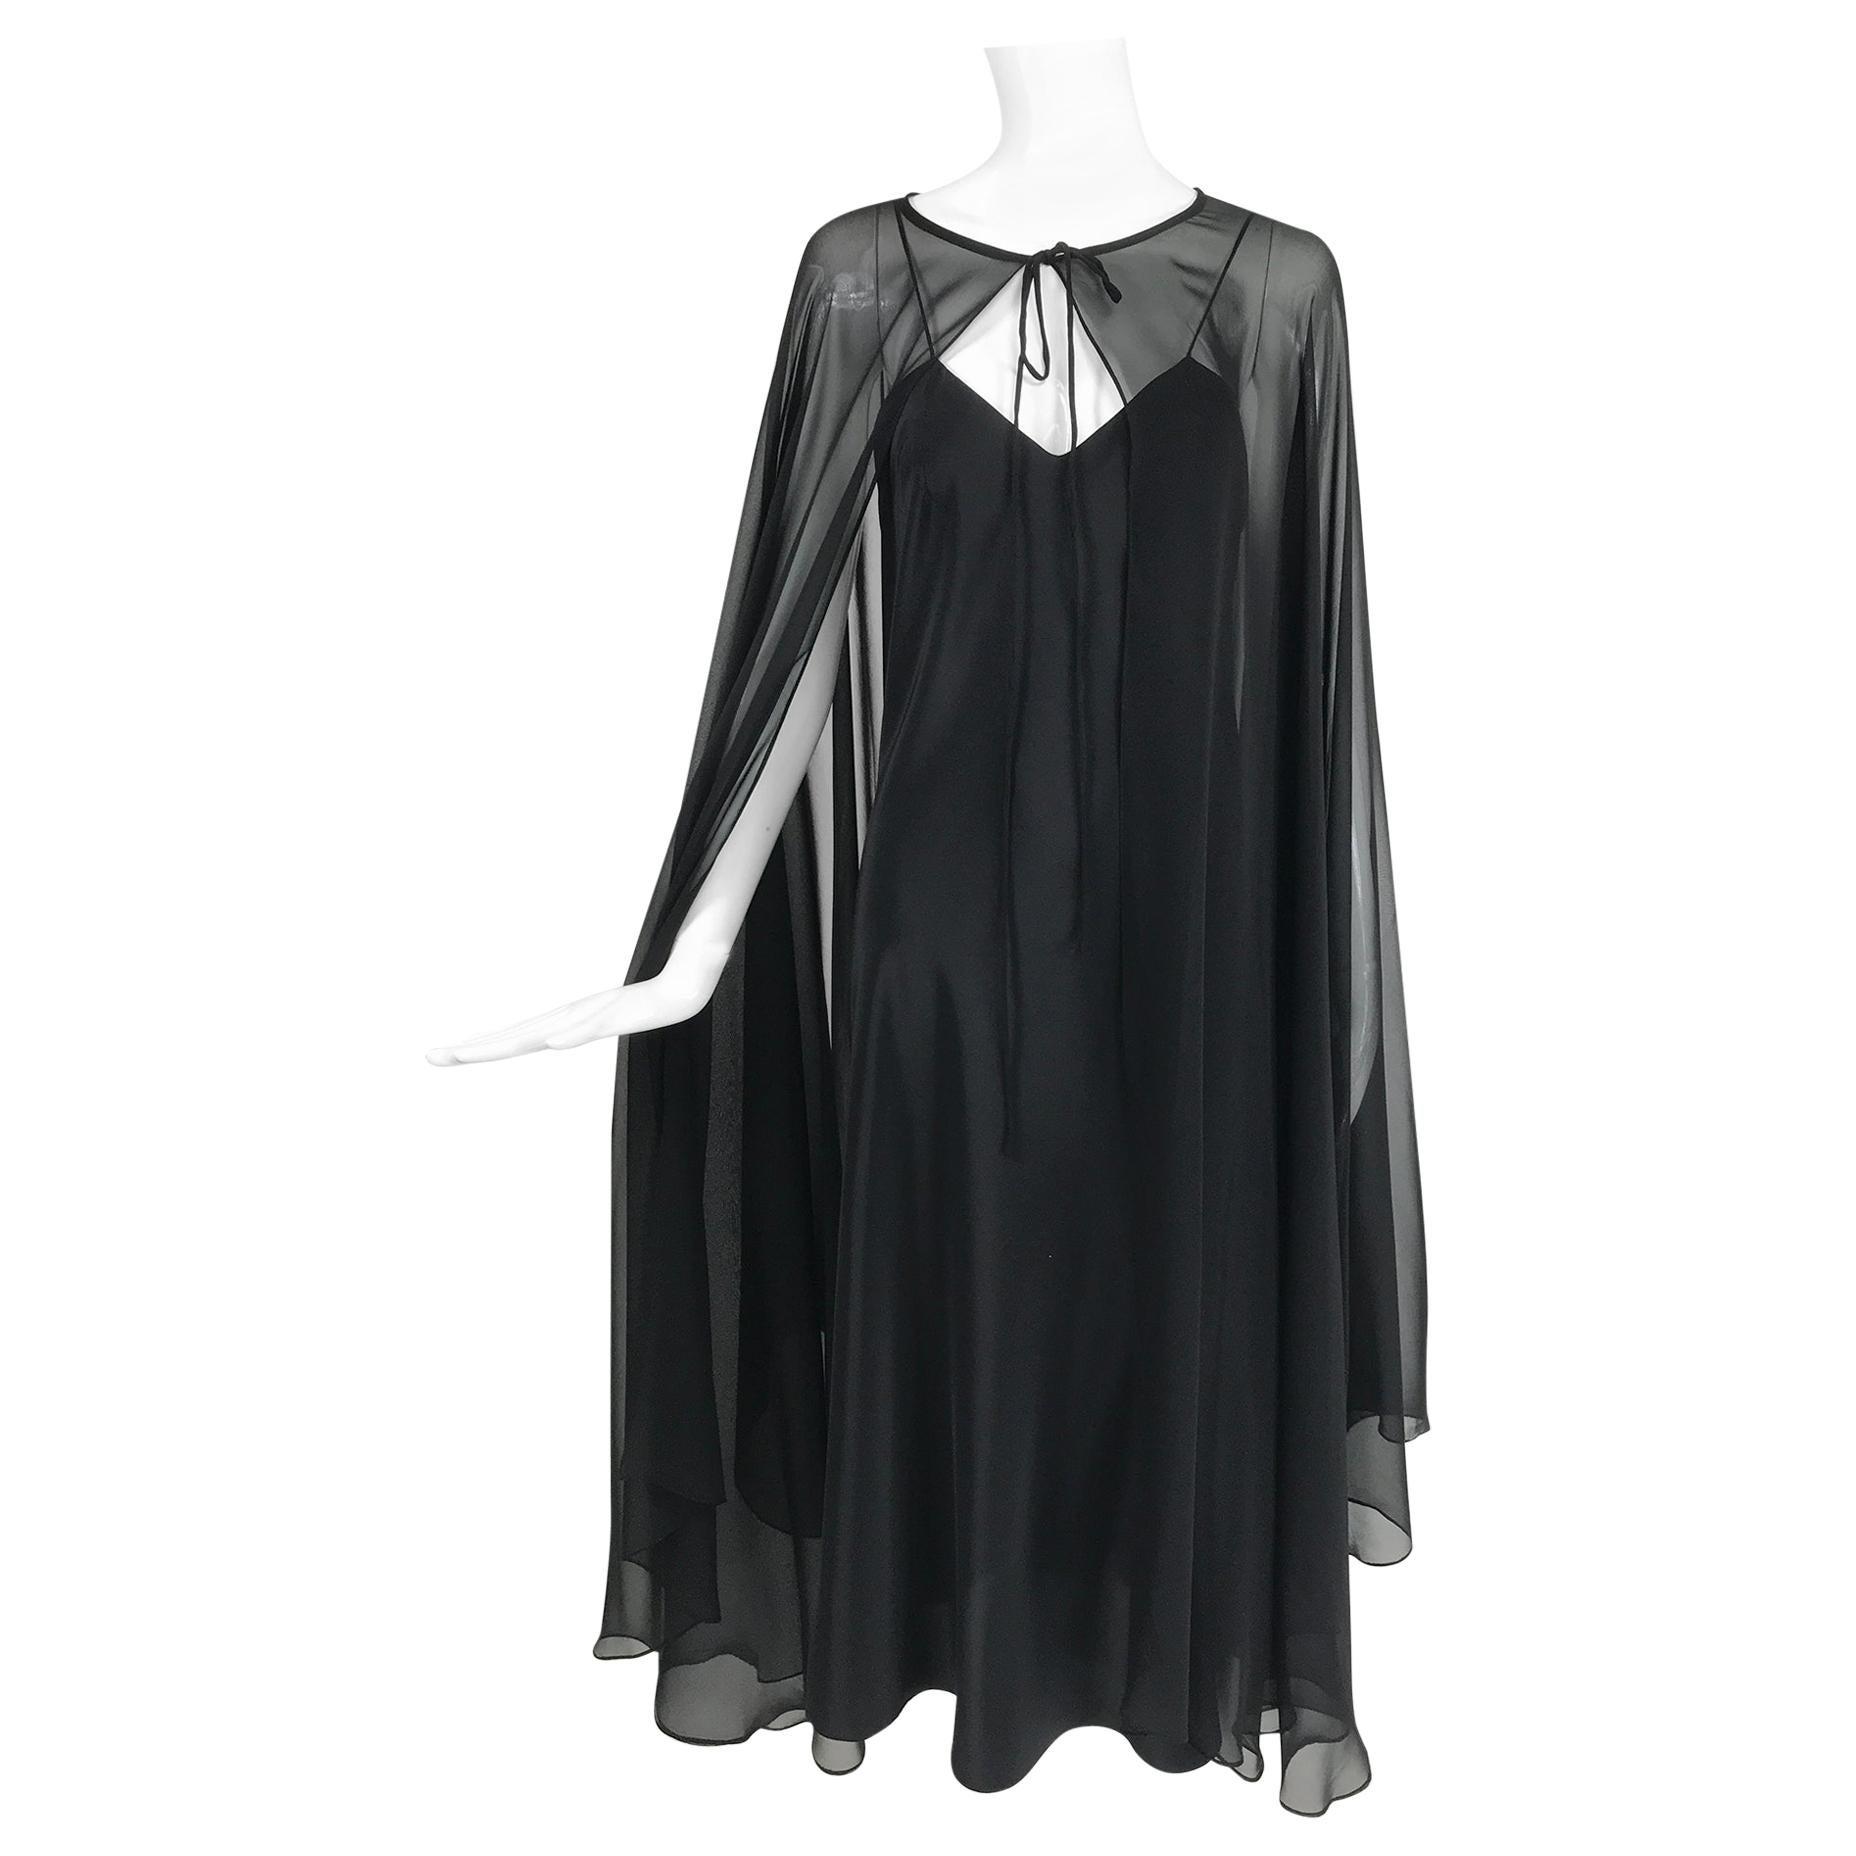 Adolfo Black Bias Cut Silk Slip Dress and Silk Chiffon Cape Set 1970s